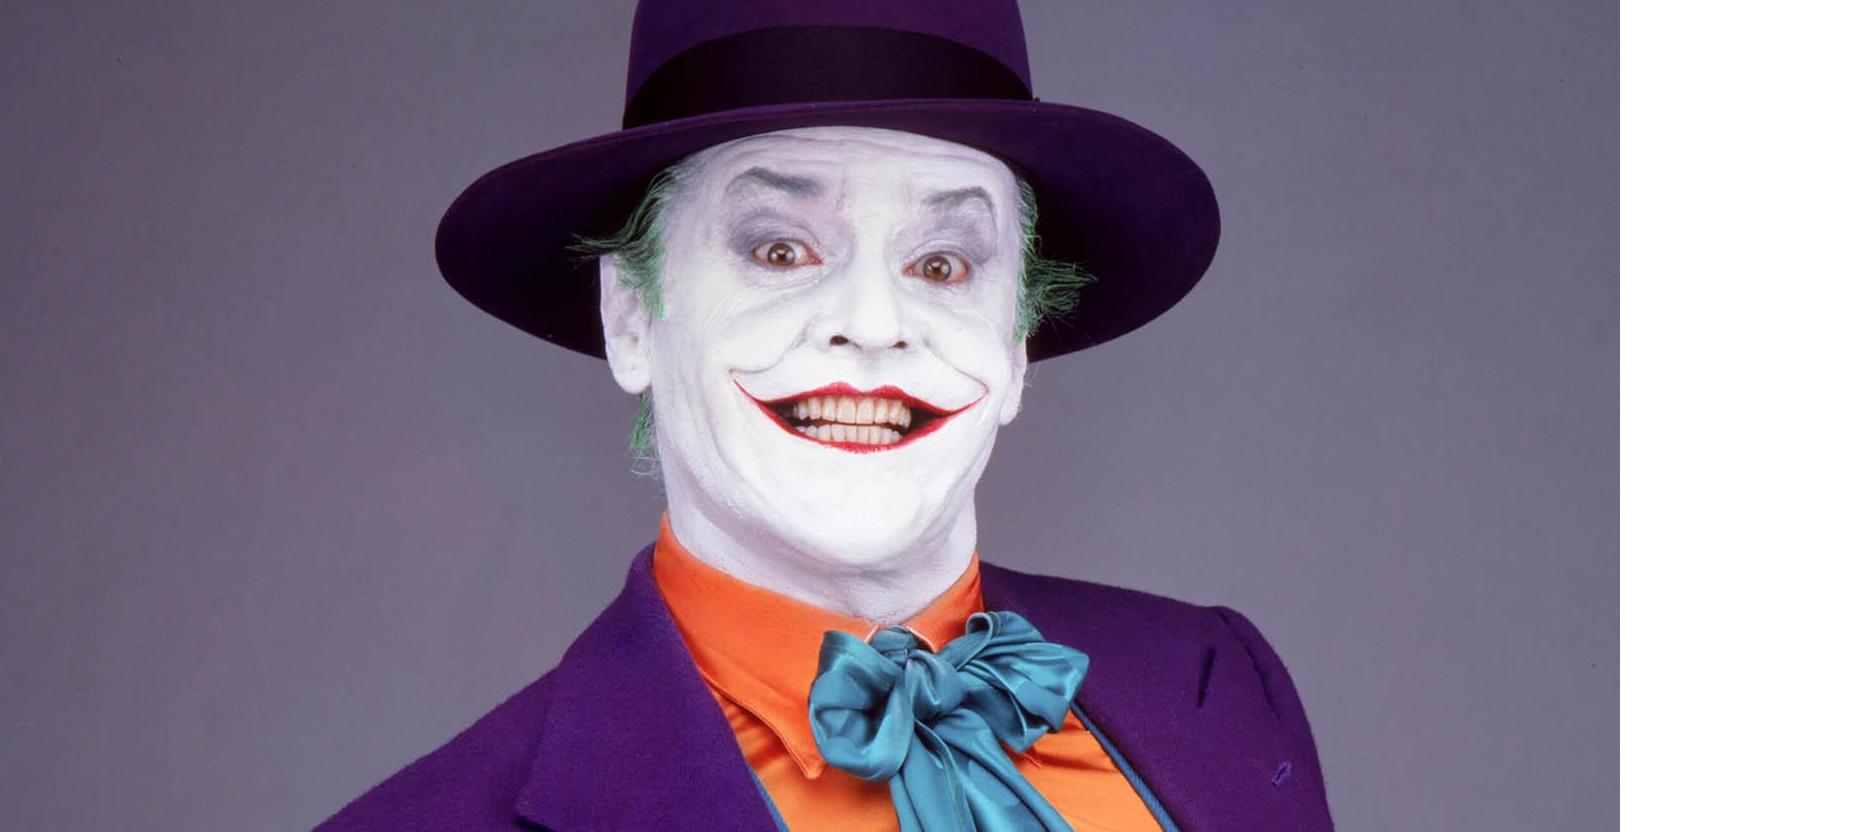 Photos of Jack Nicholson as The Joker from Batman 1989